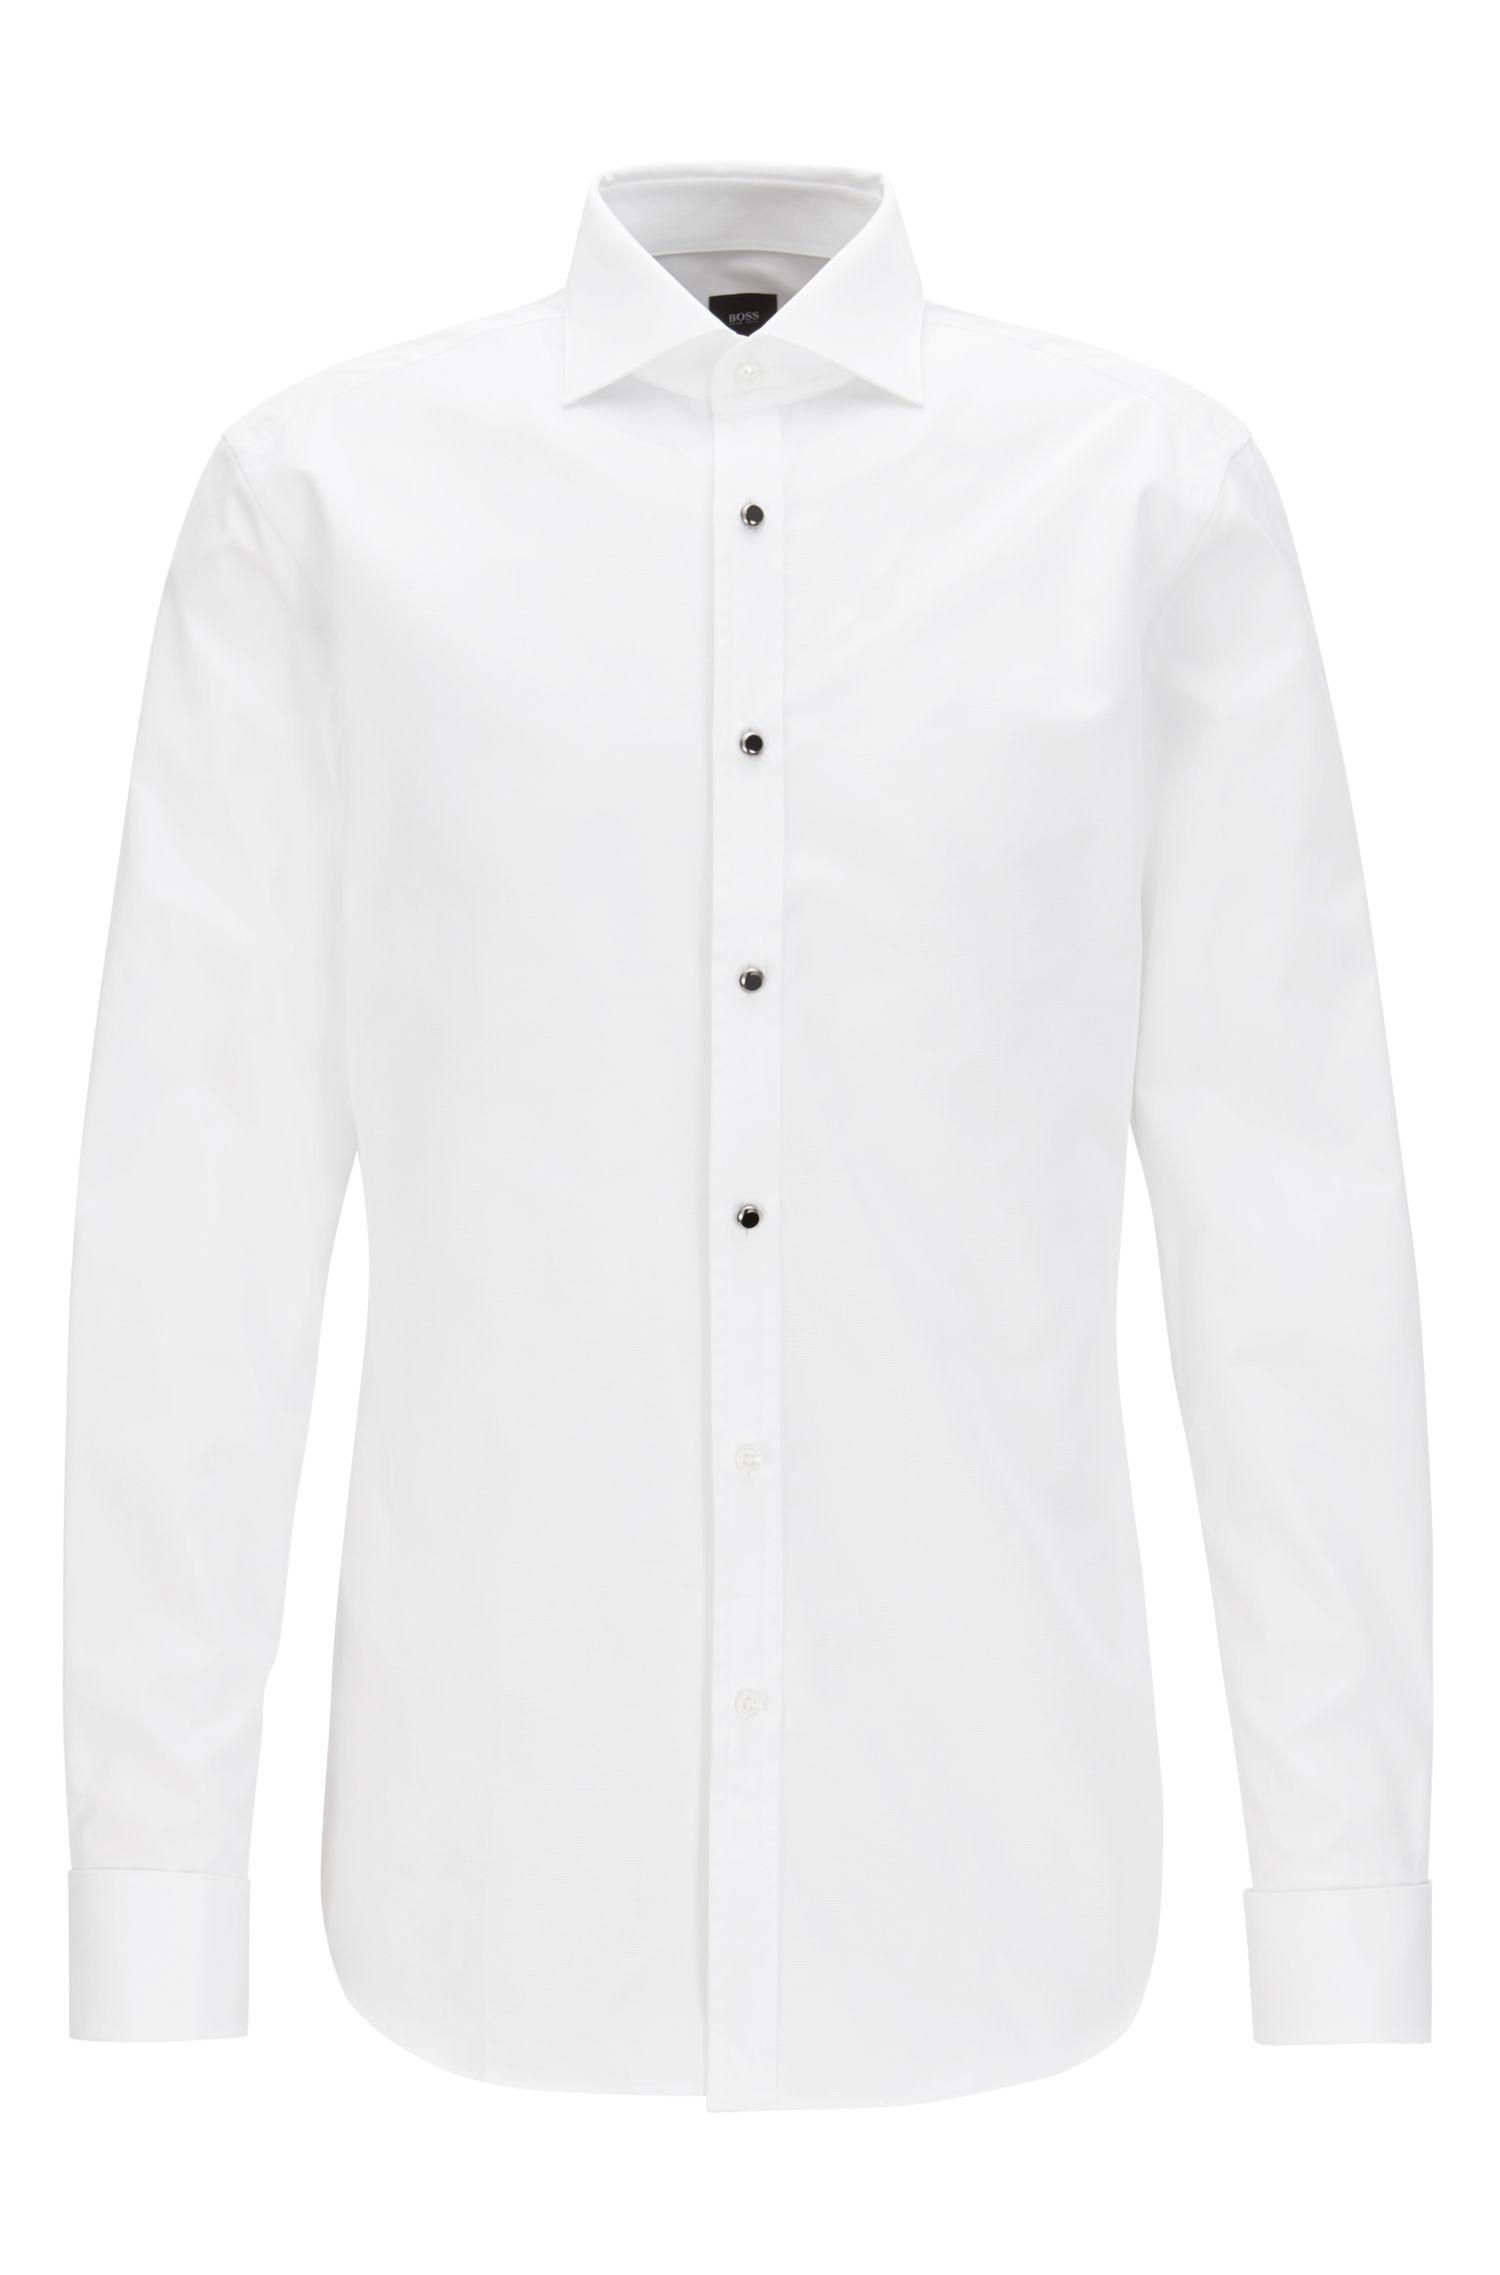 Cotton Dress Shirt, Slim Fit | T-Clayton